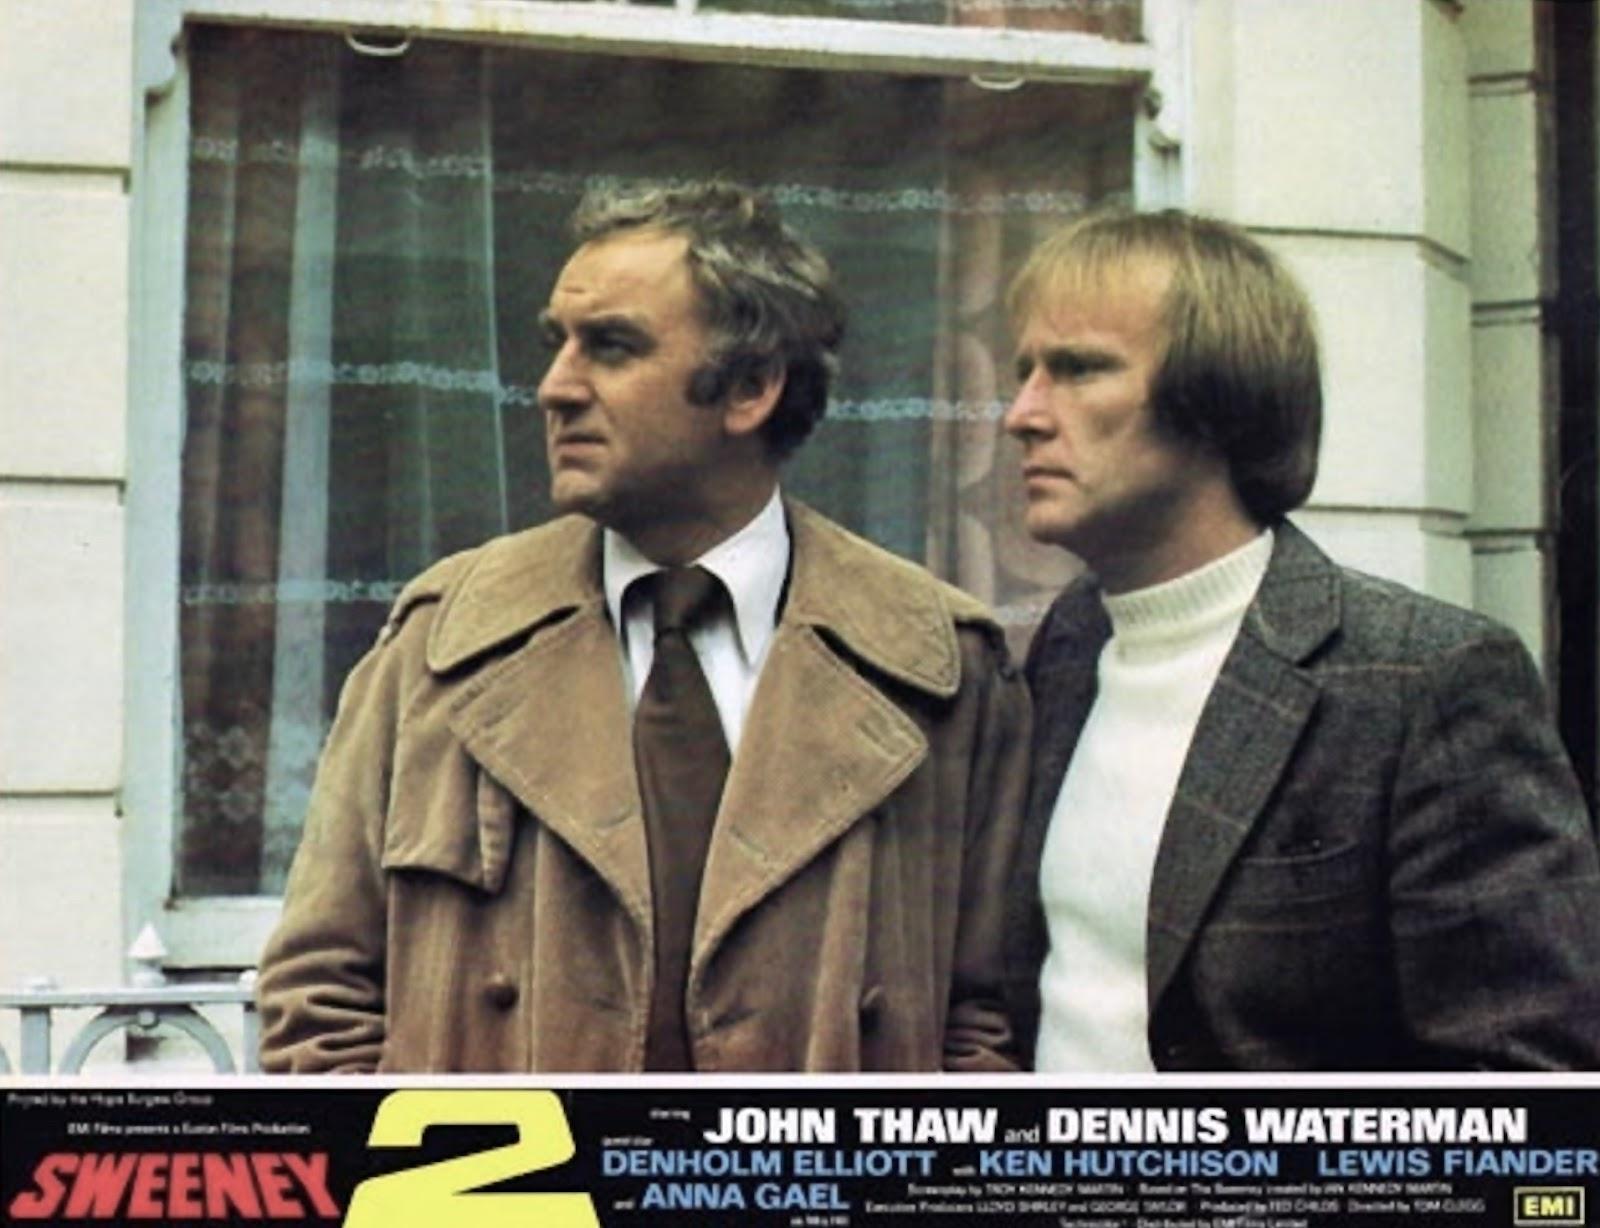 Sweeney original 1977 lobby card John Thaw Diane Keen